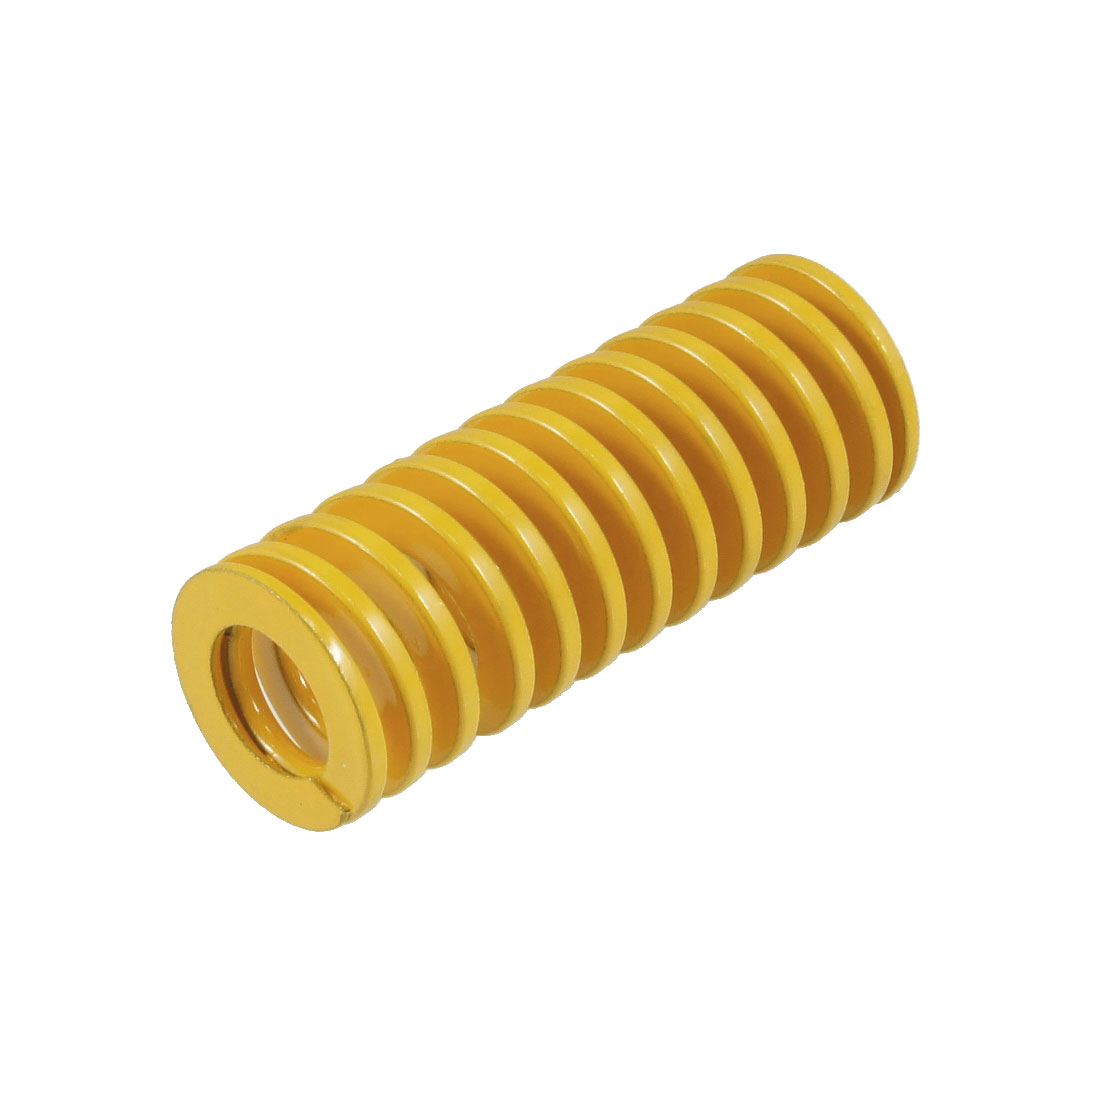 Orange 30mm x 17mm x 80mm Metal Tubular Section Mould Die Spring